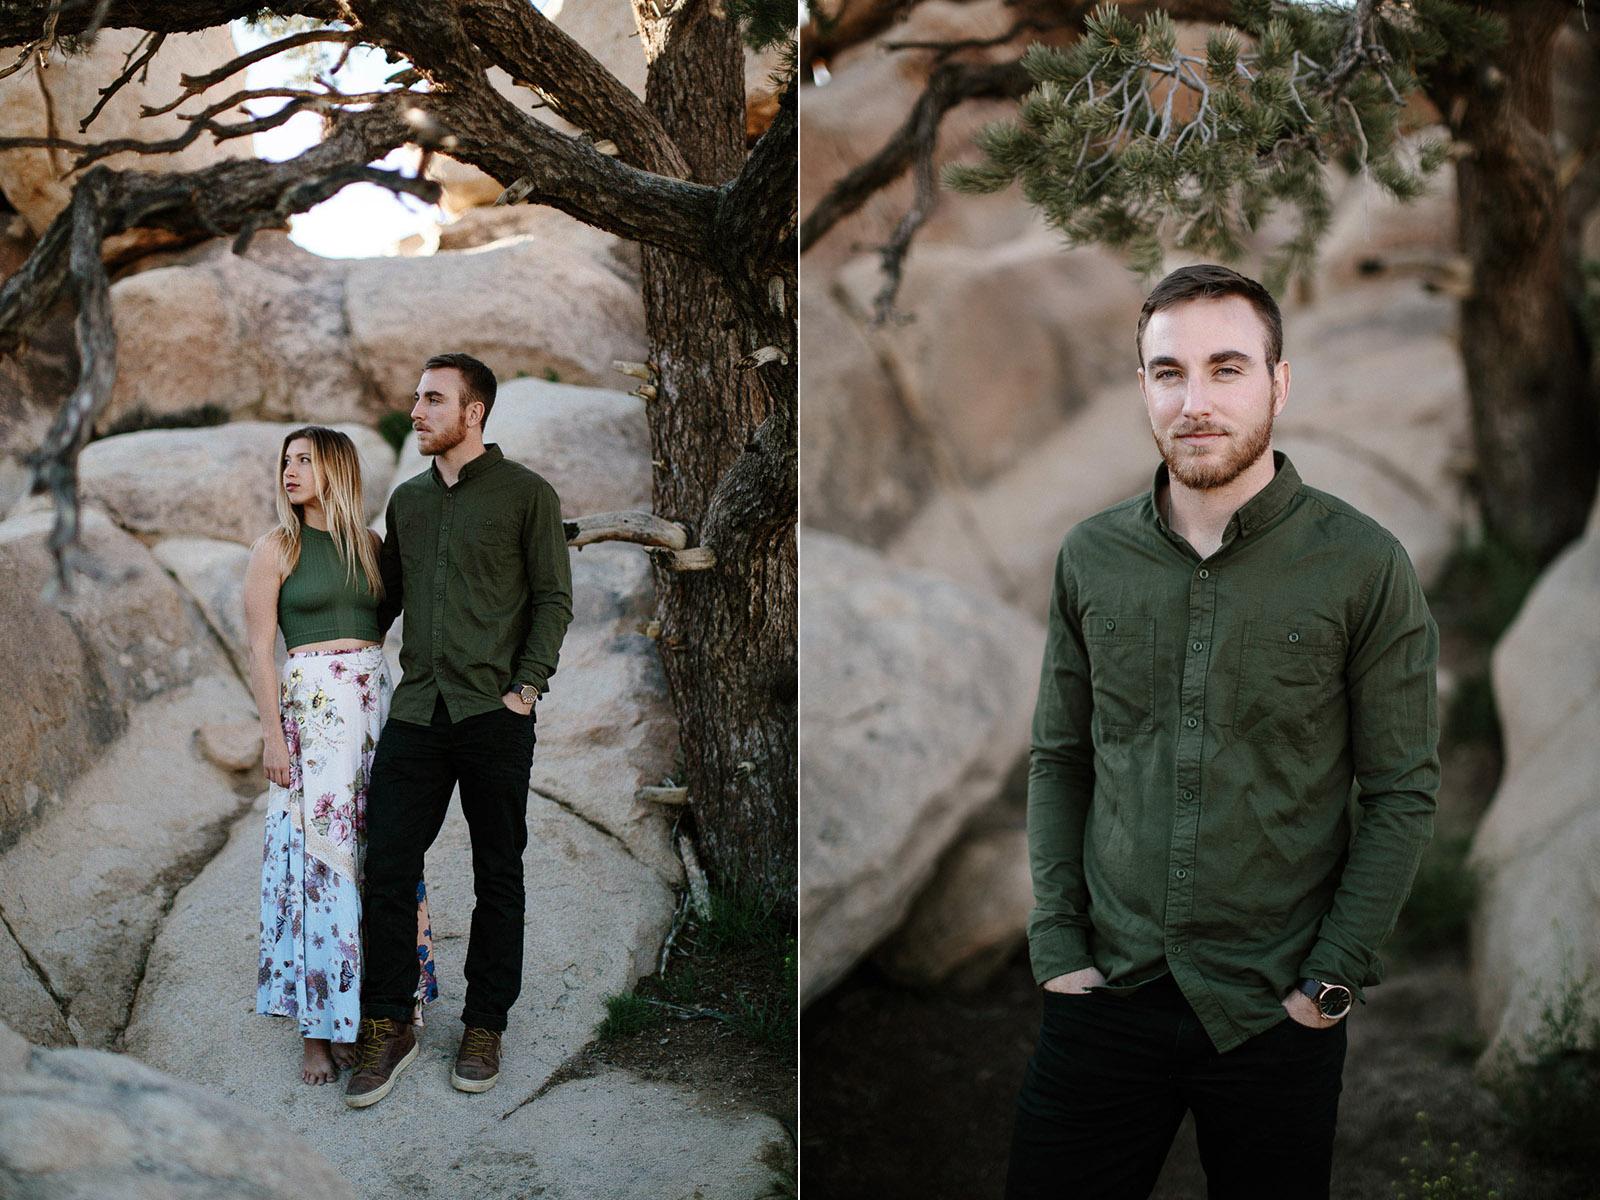 Joshua_Tree_Engagement_Wedding_Elopement_Photogapher_41.jpg